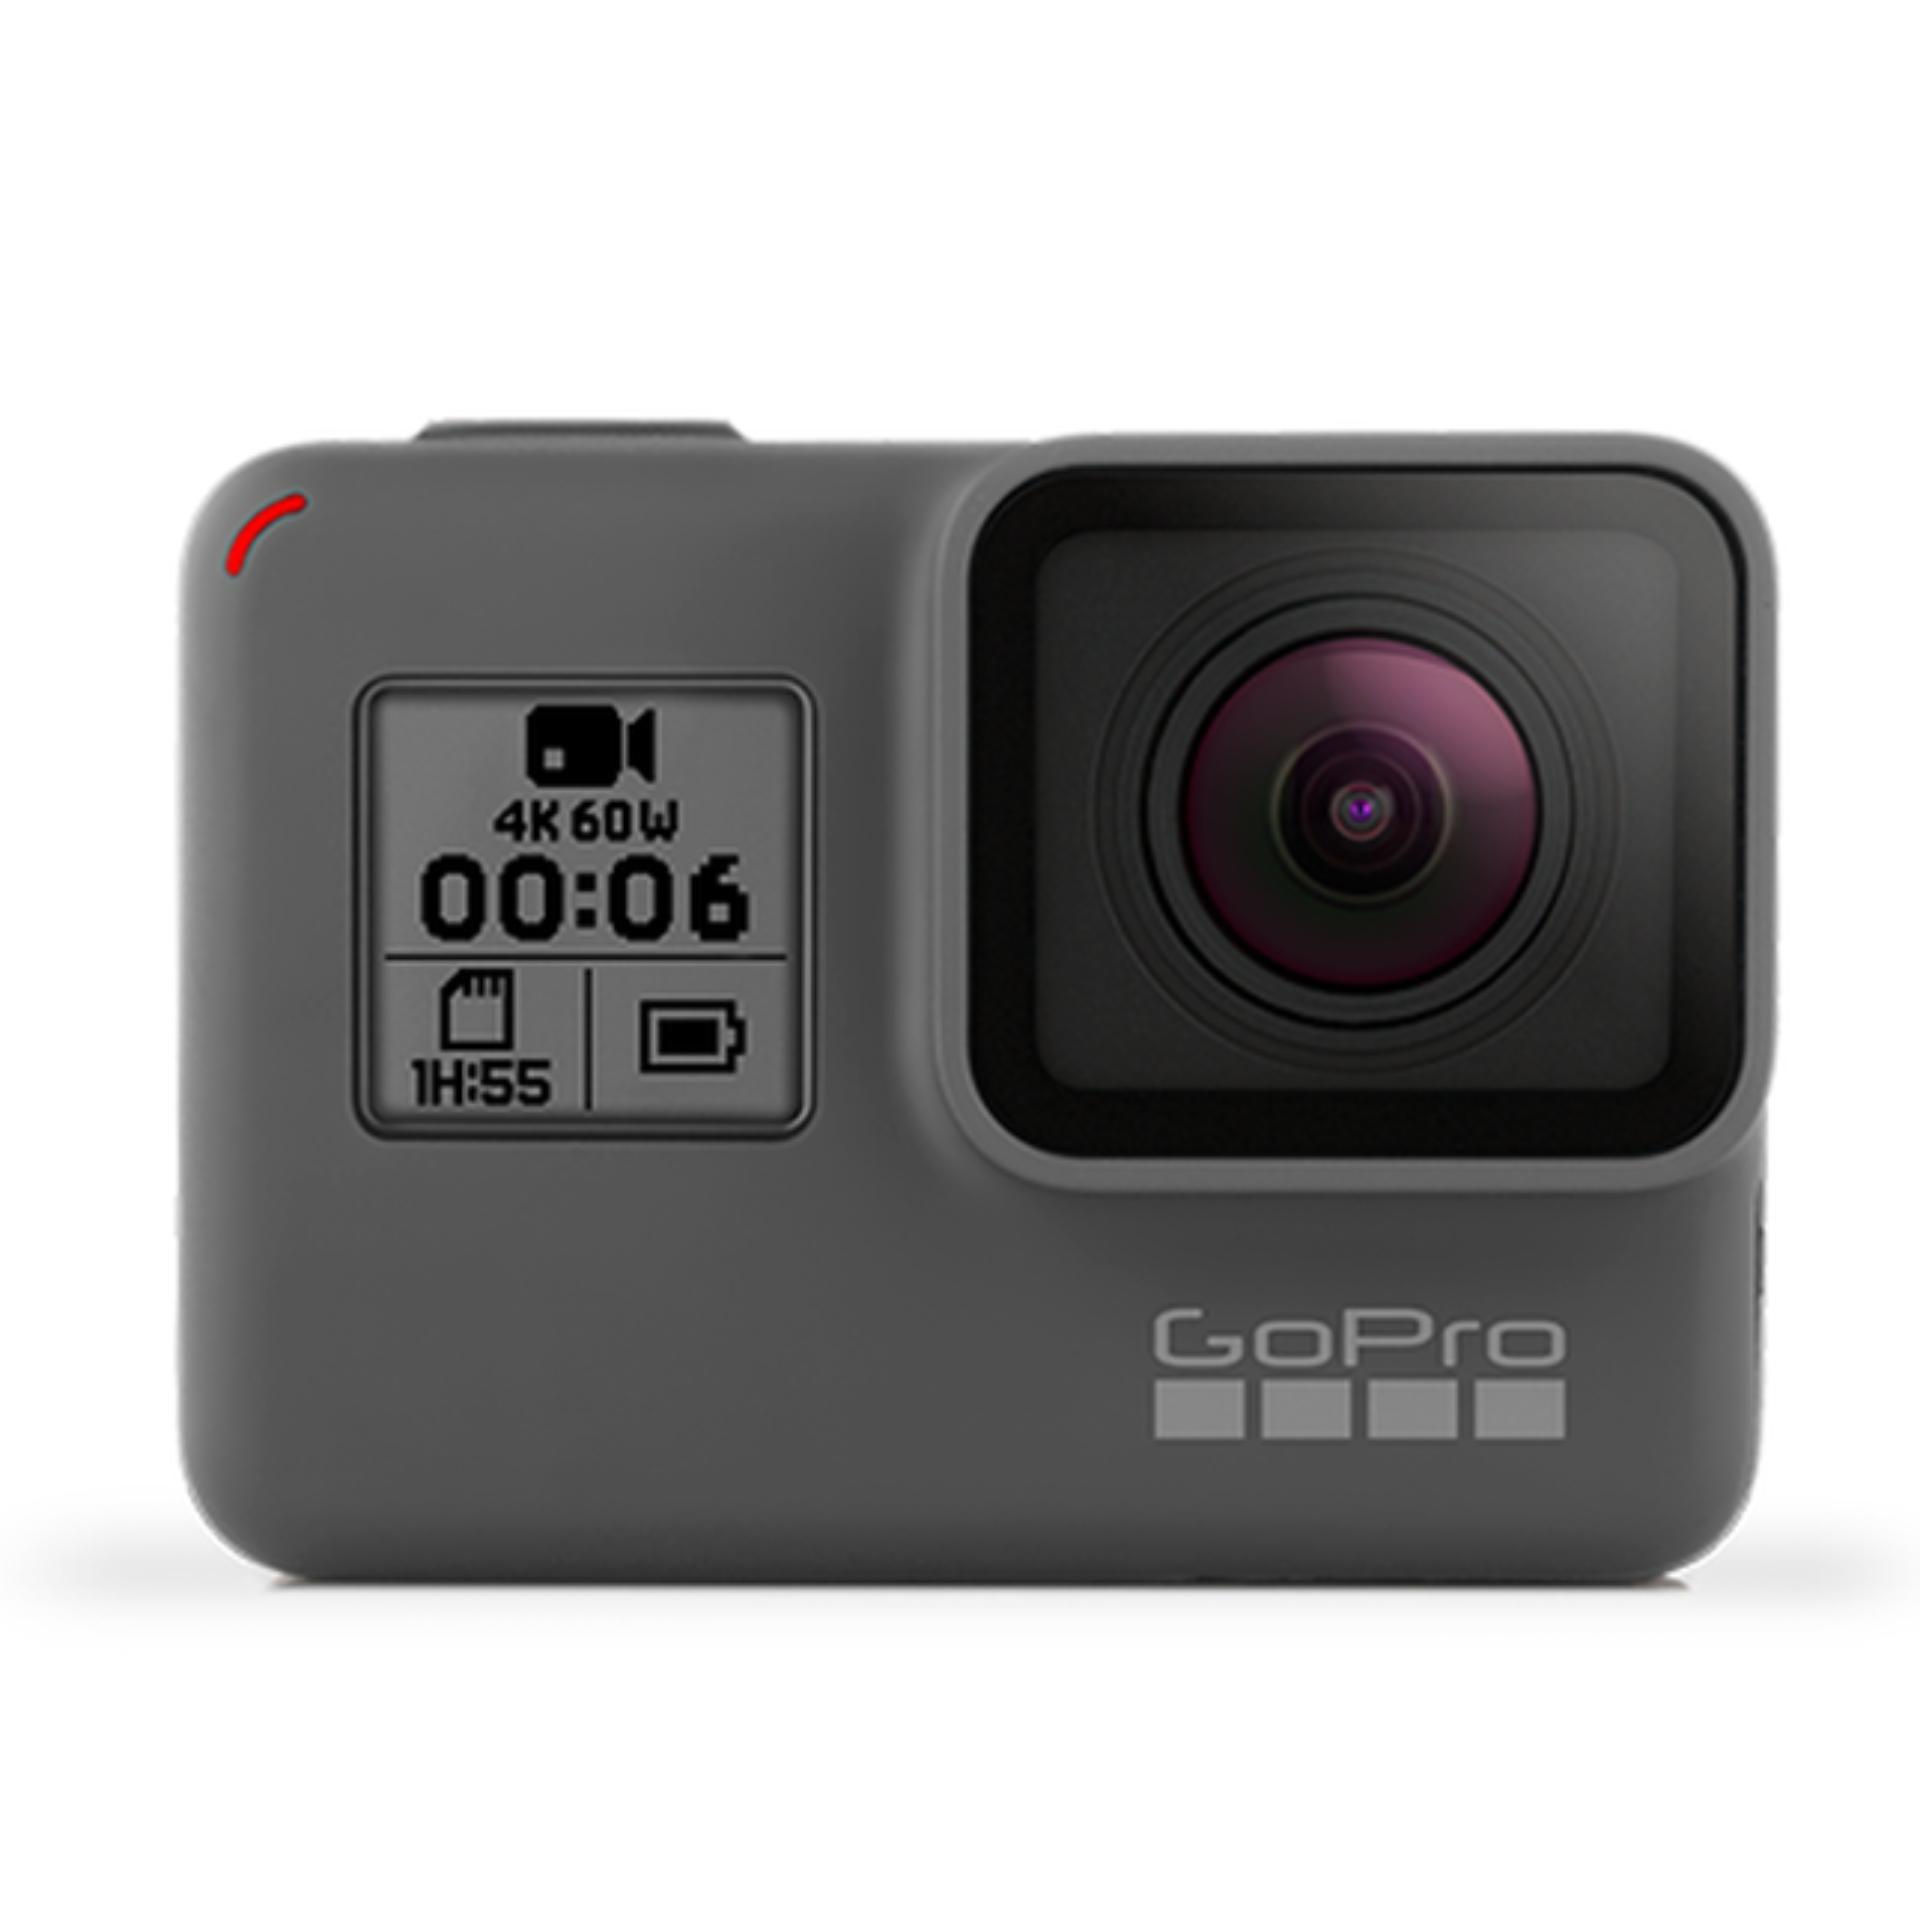 GoPro Hero 6 4k Action Camera Built-In New G1 Chip (Black) LOCAL WARRANTY